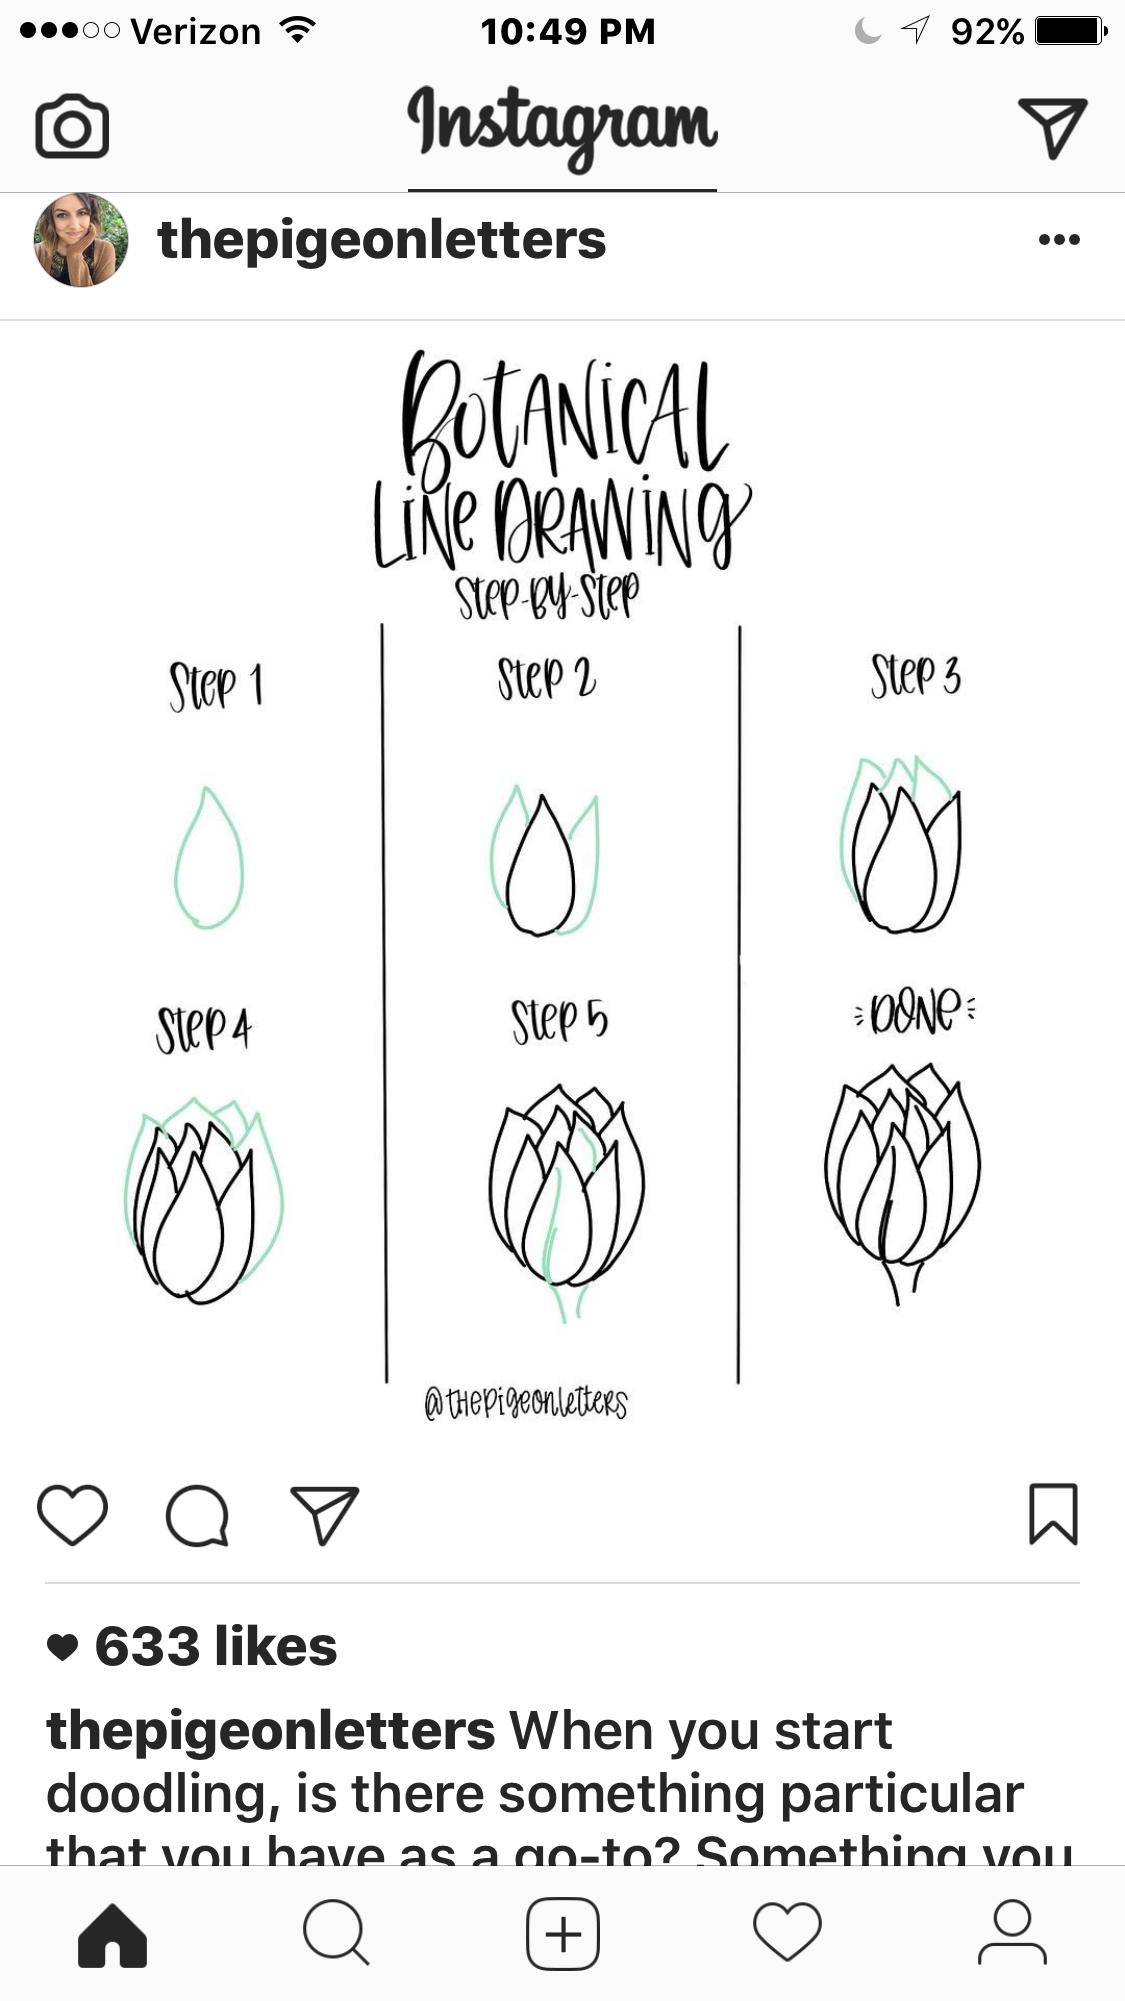 botanical line drawing peggy dean pdf